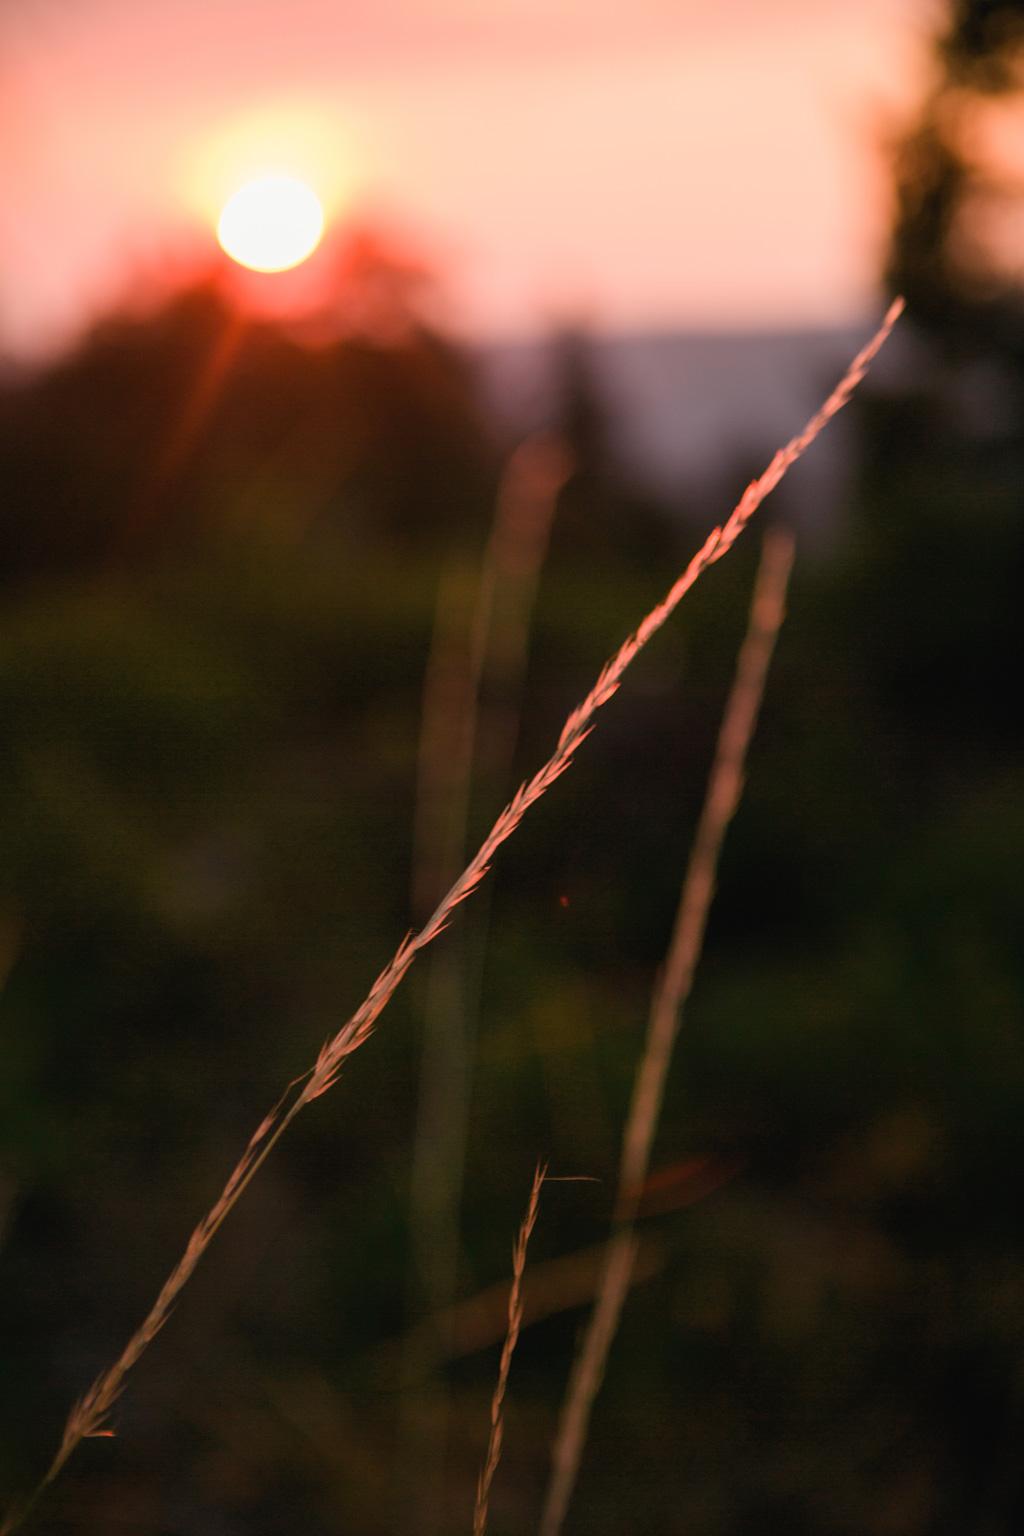 CindyGiovagnoli_California_Nevada_photographer_NevadaCity_PerseidMeteorShower_StampedeReservoir_truck_camping_VirginiaCity_MarkTwain_sunset-013.jpg